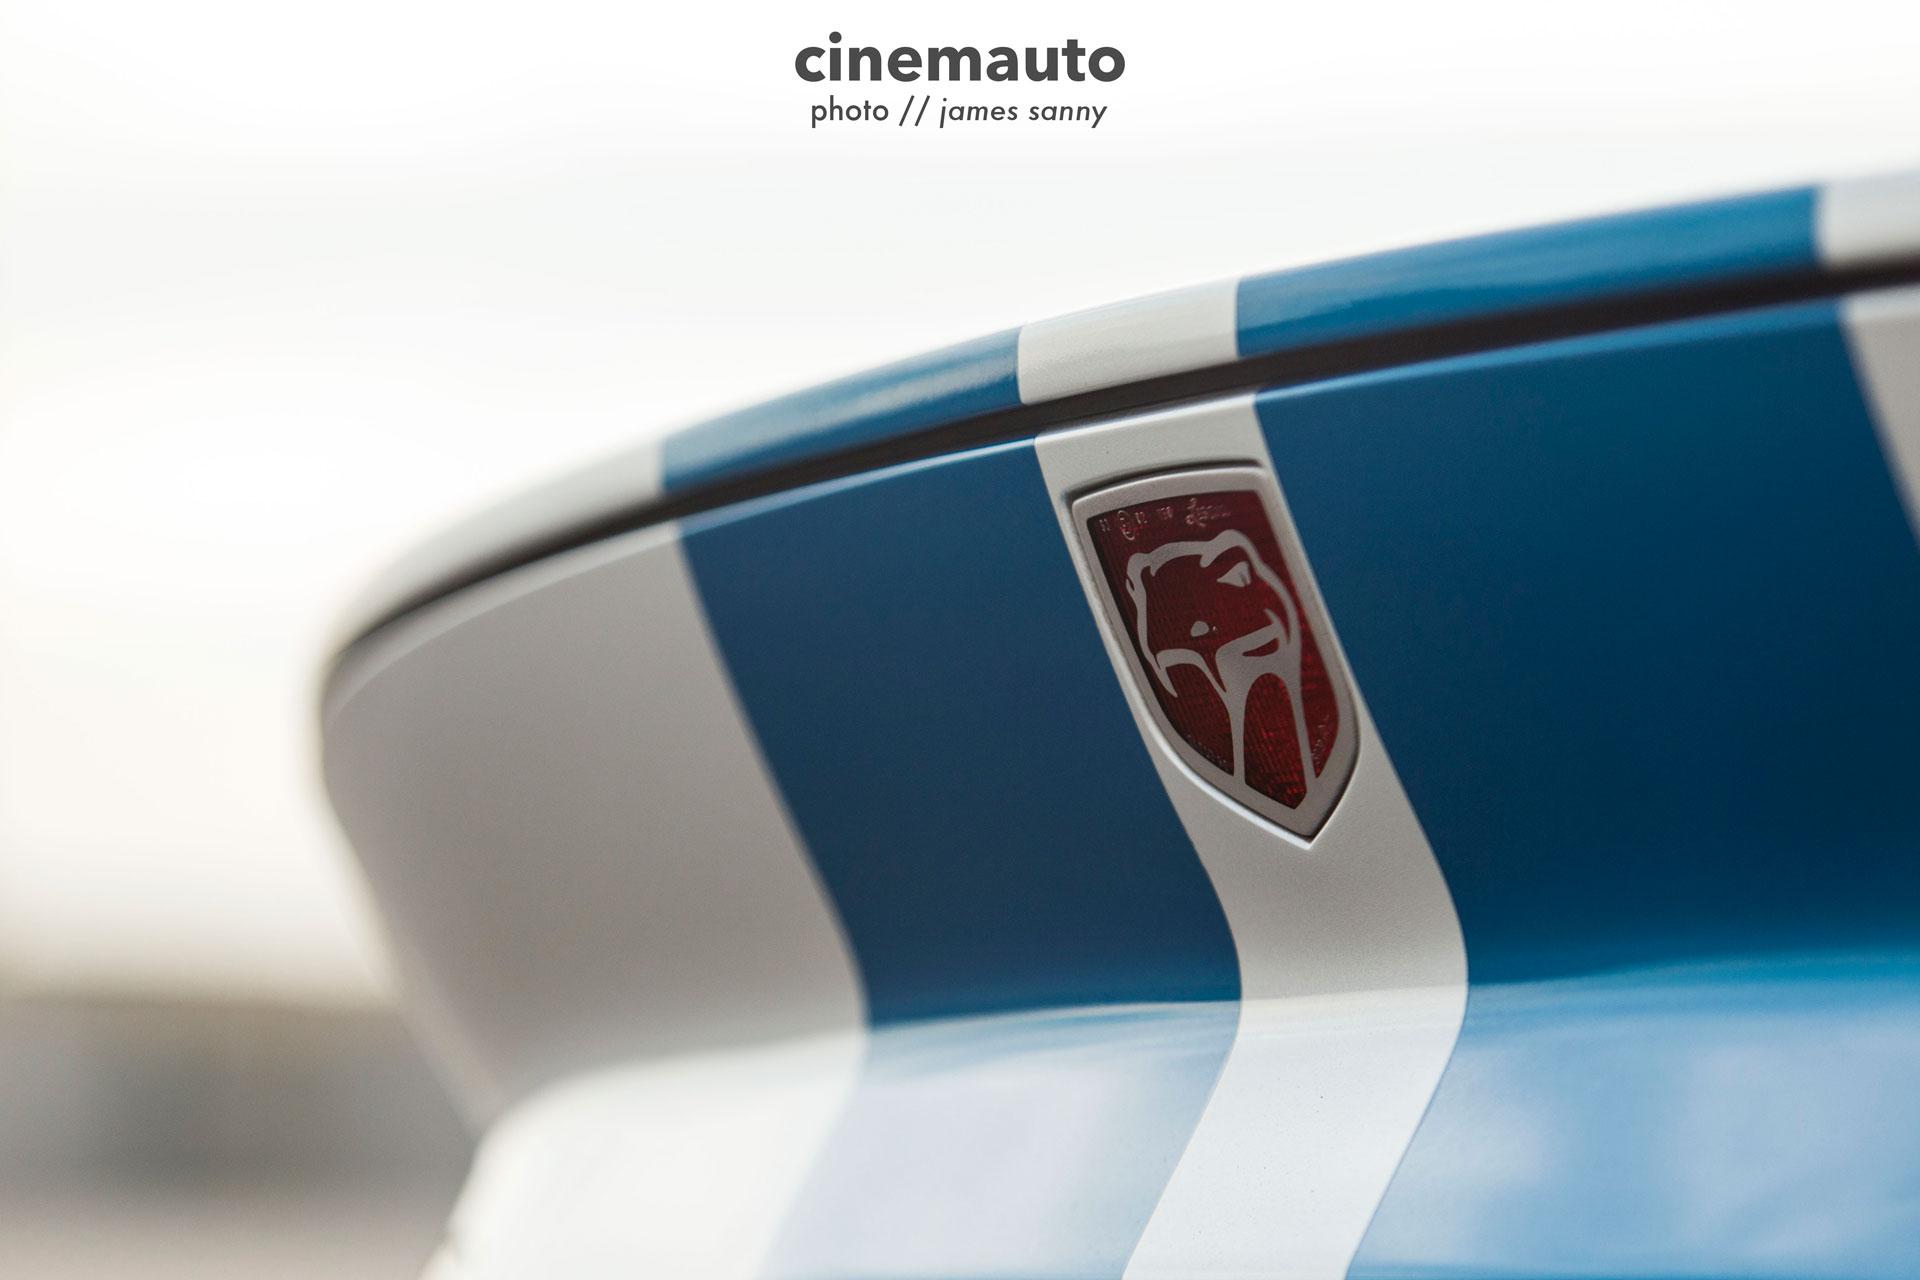 cinemauto_3-sm.jpg